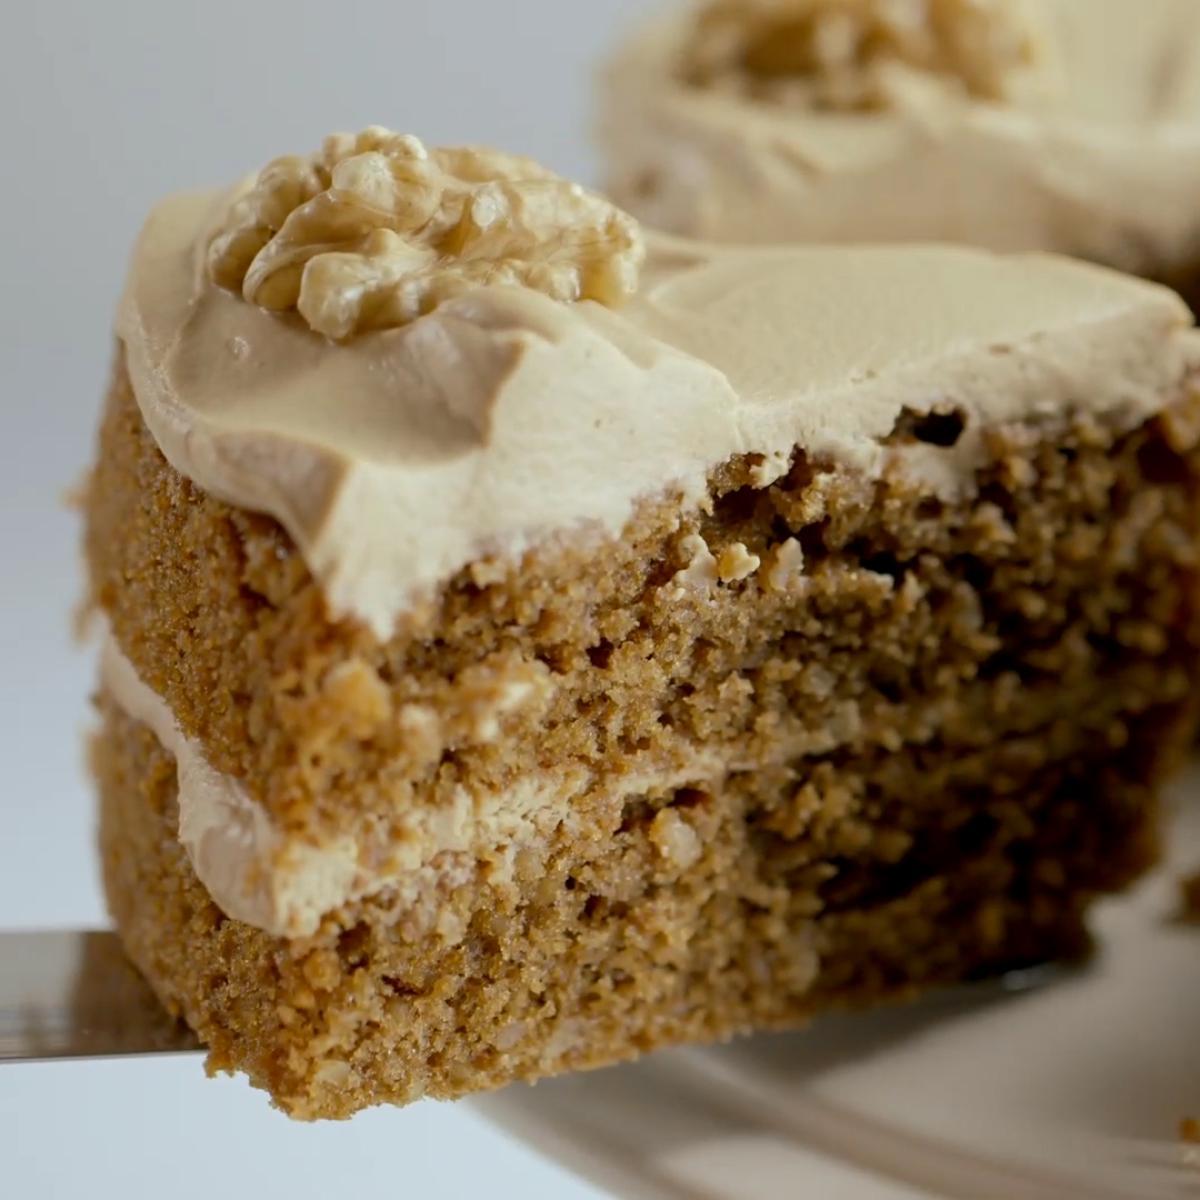 A picture of Delia's Coffee and Walnut Sponge Cake recipe